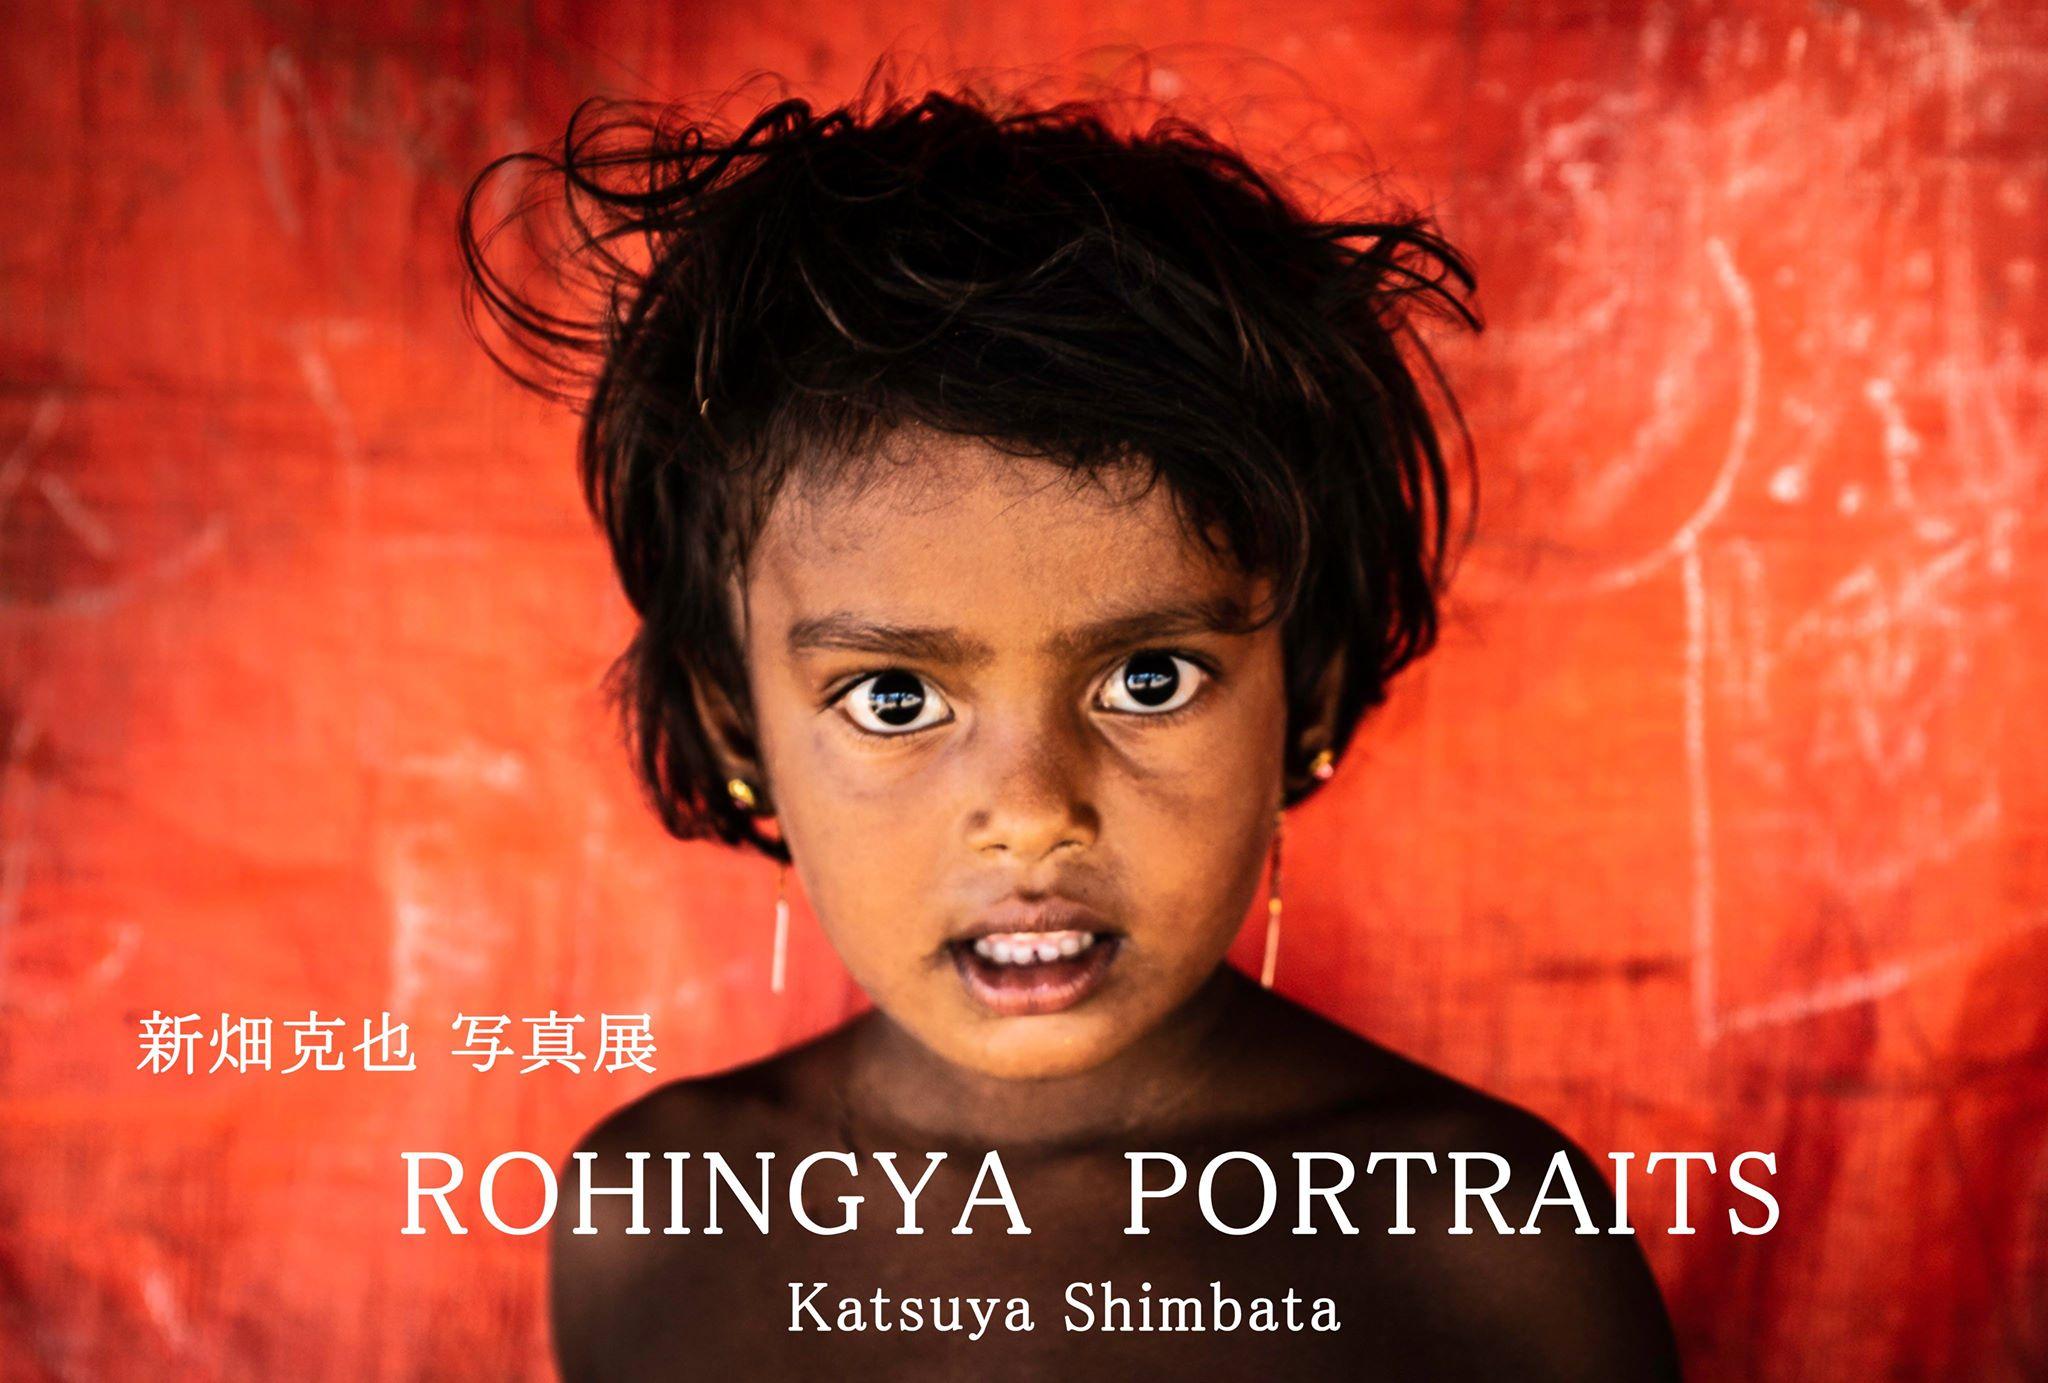 新畑克也 写真展 「ROHINGYA PORTRAITS」